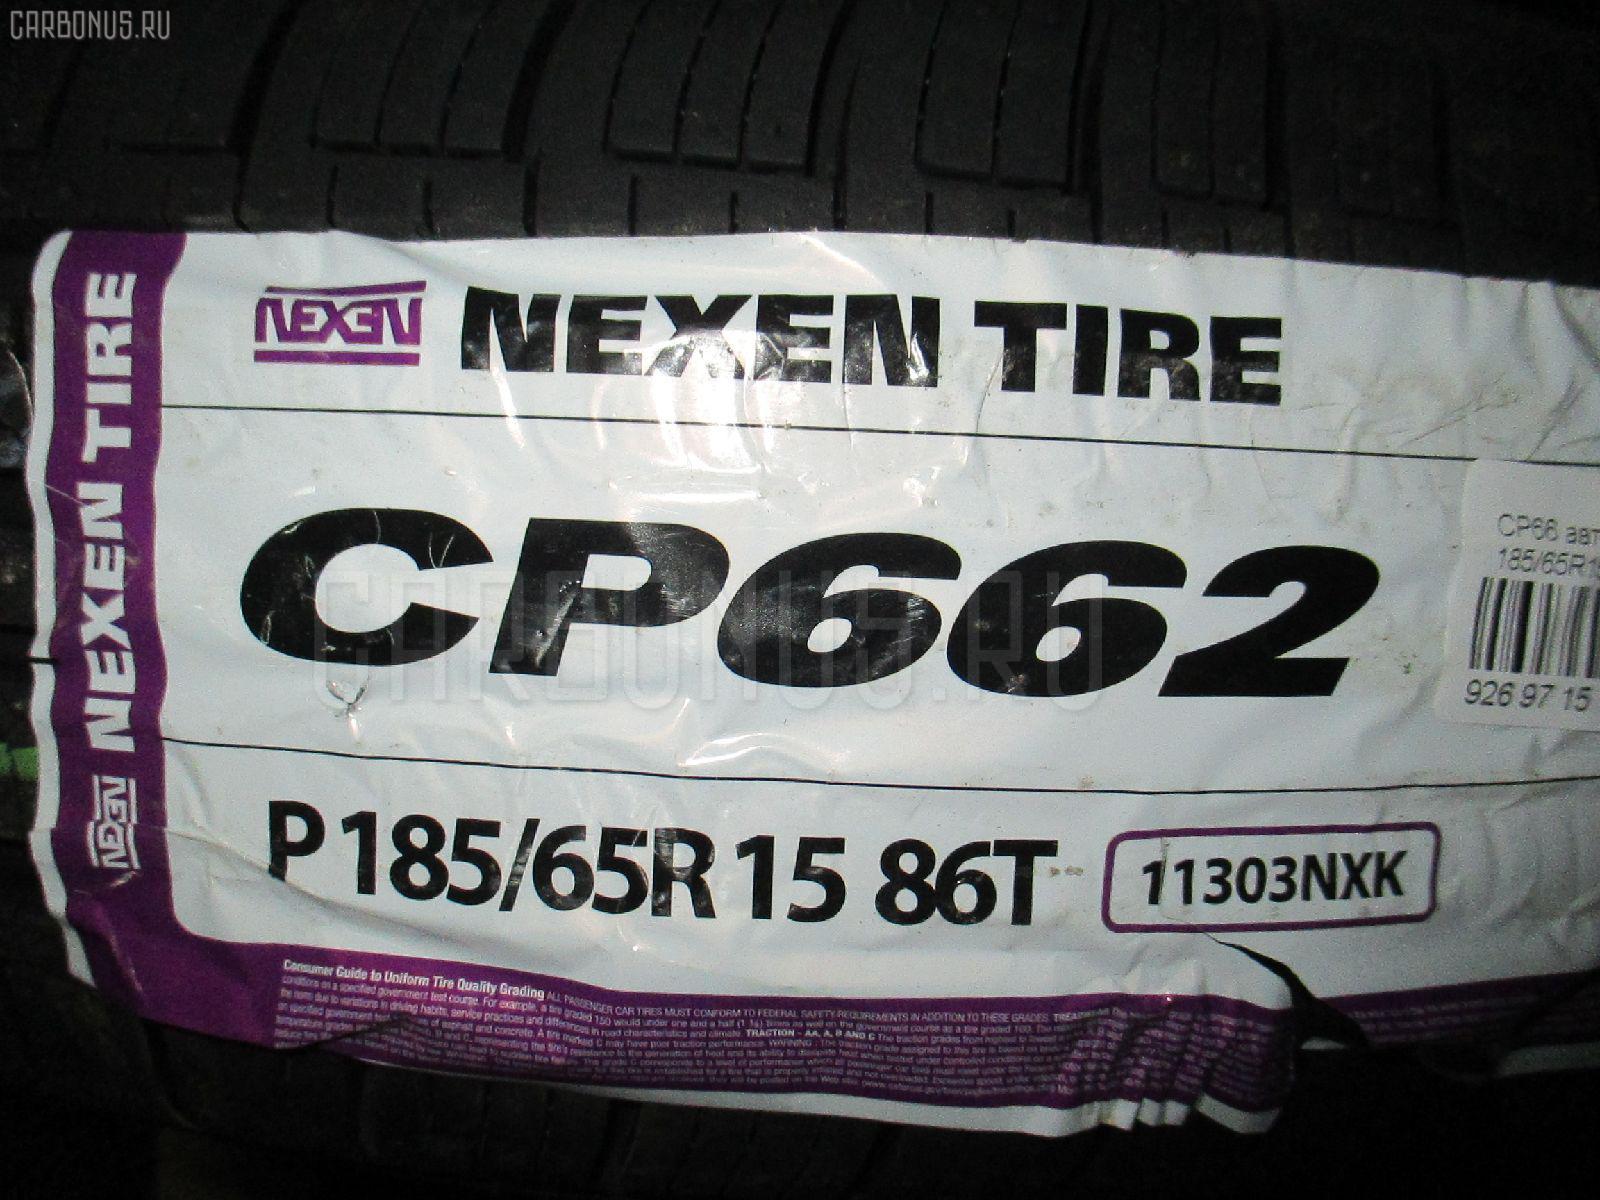 Автошина легковая летняя CP662 185/65R15 NEXEN Фото 1